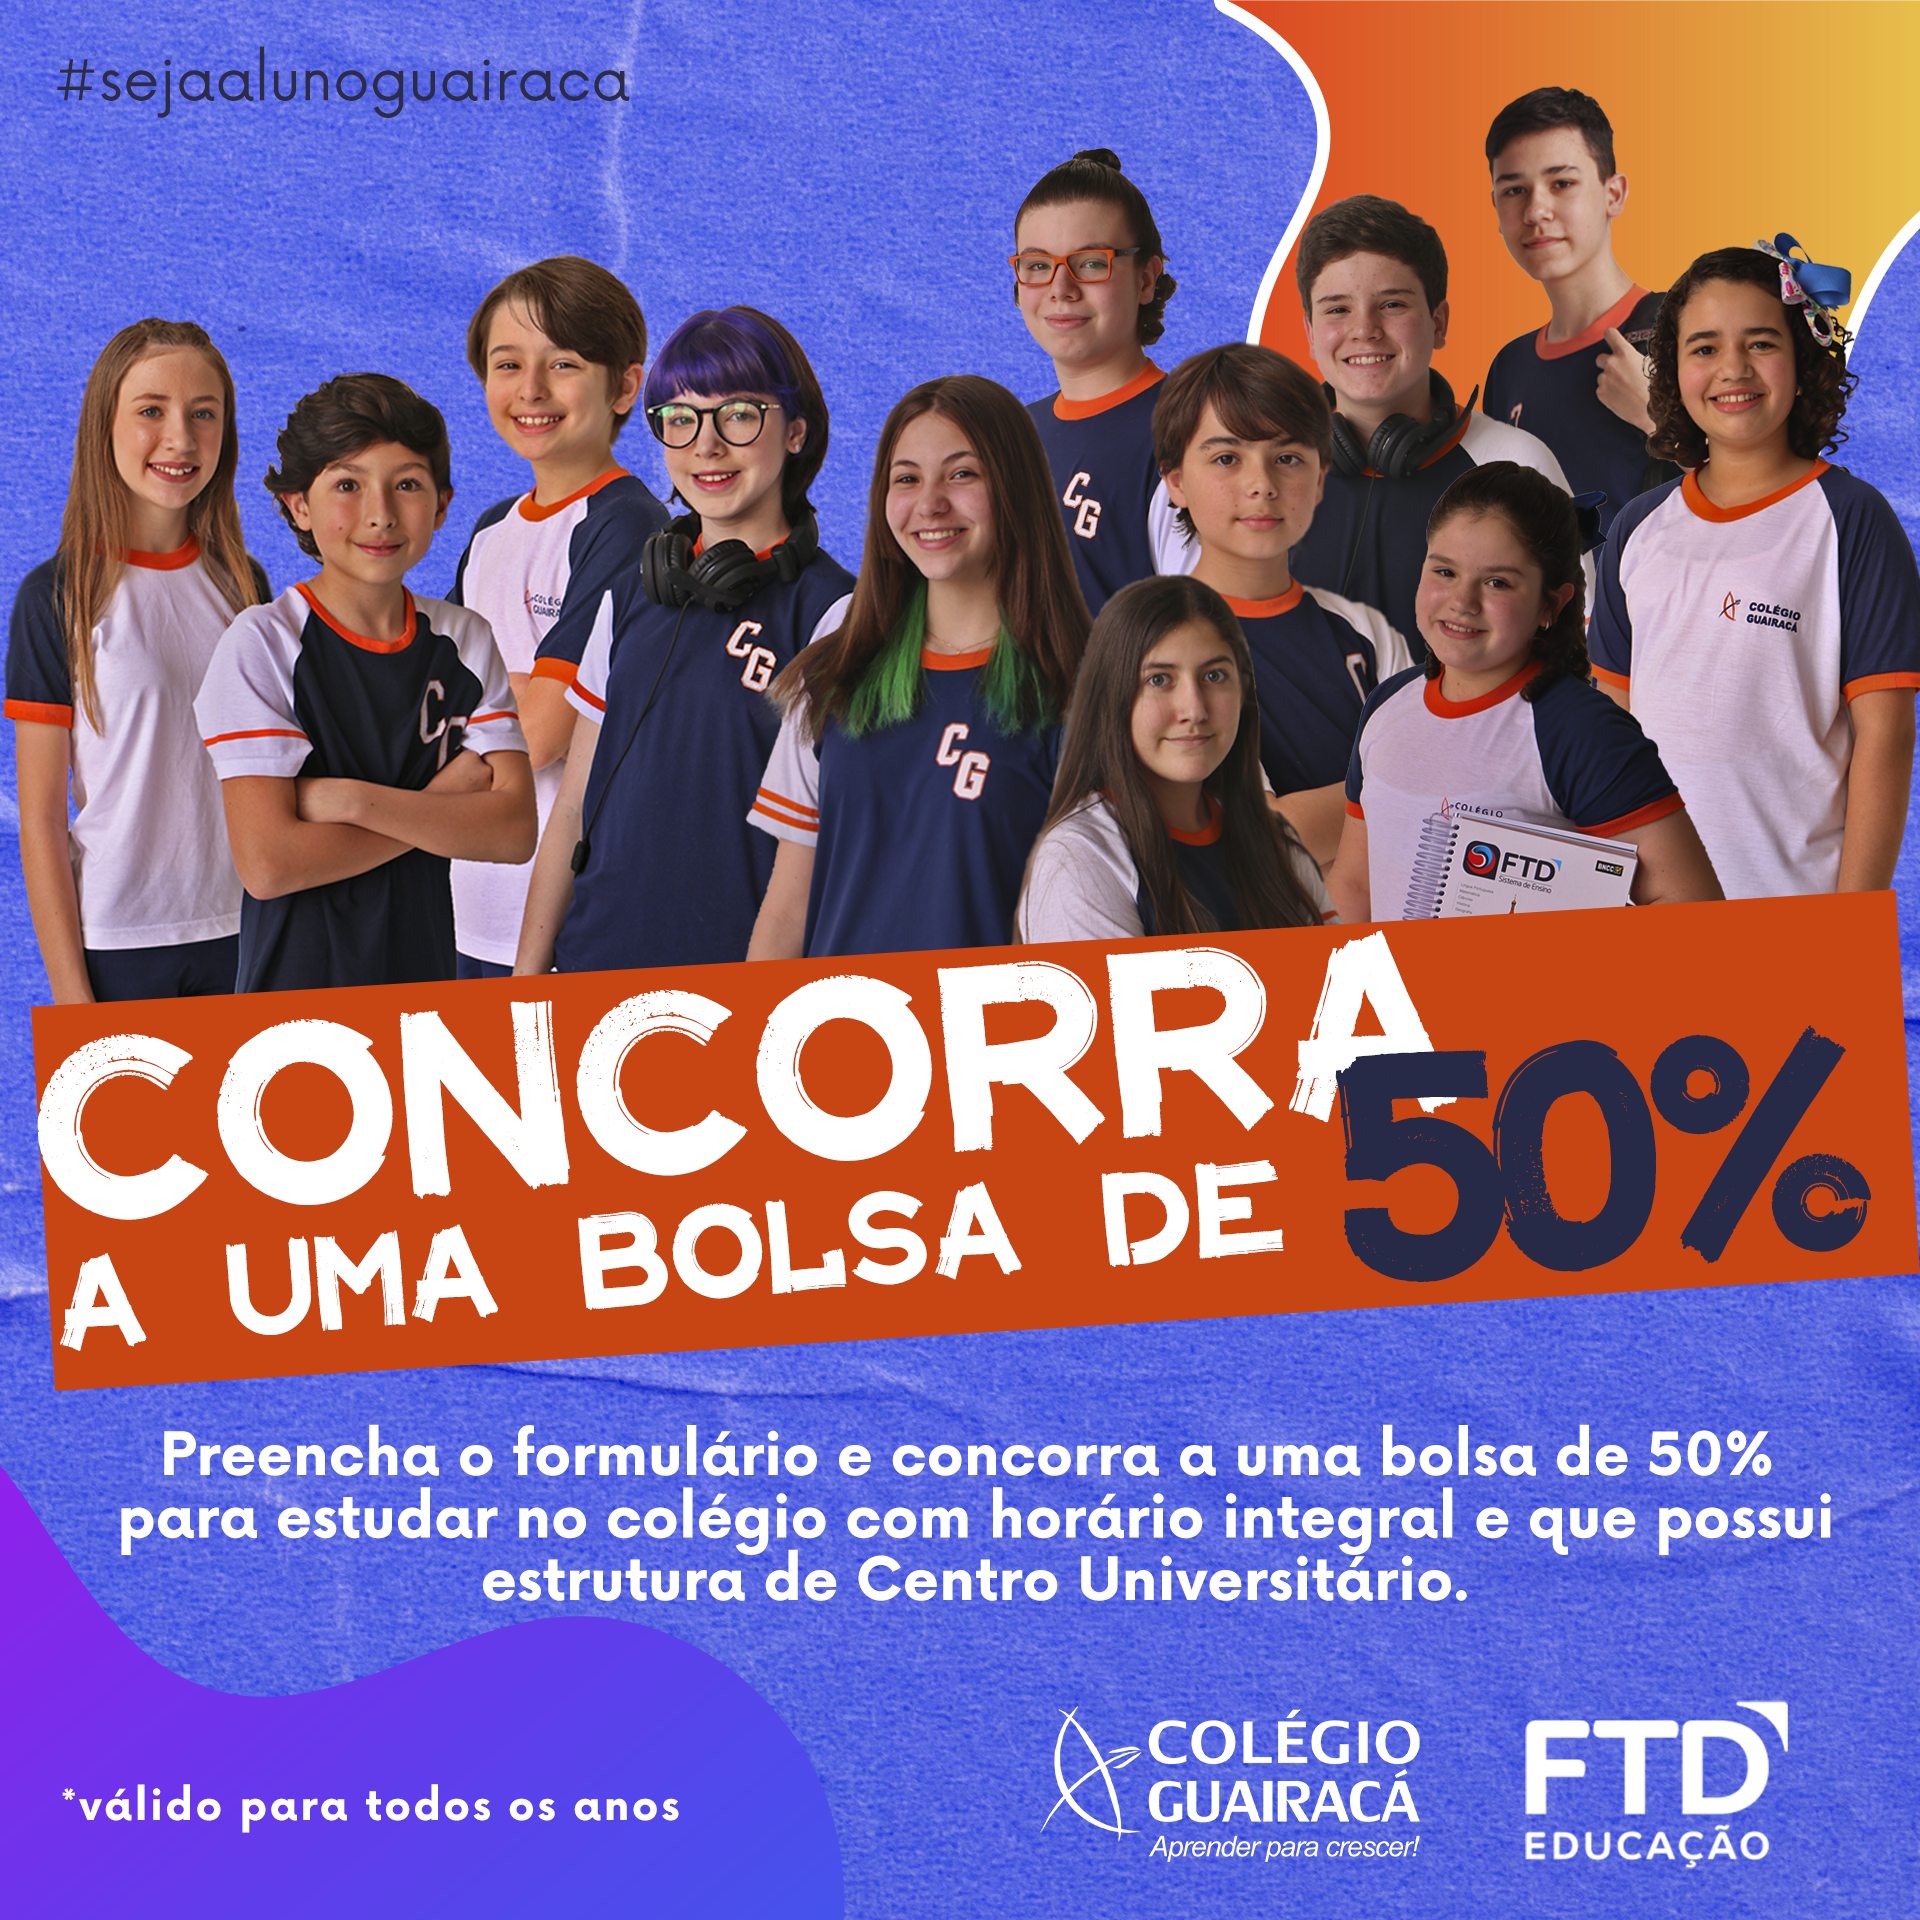 Amigo indica amigo: Colégio Guairacá realiza sorteio de bolsa de estudo para 2021